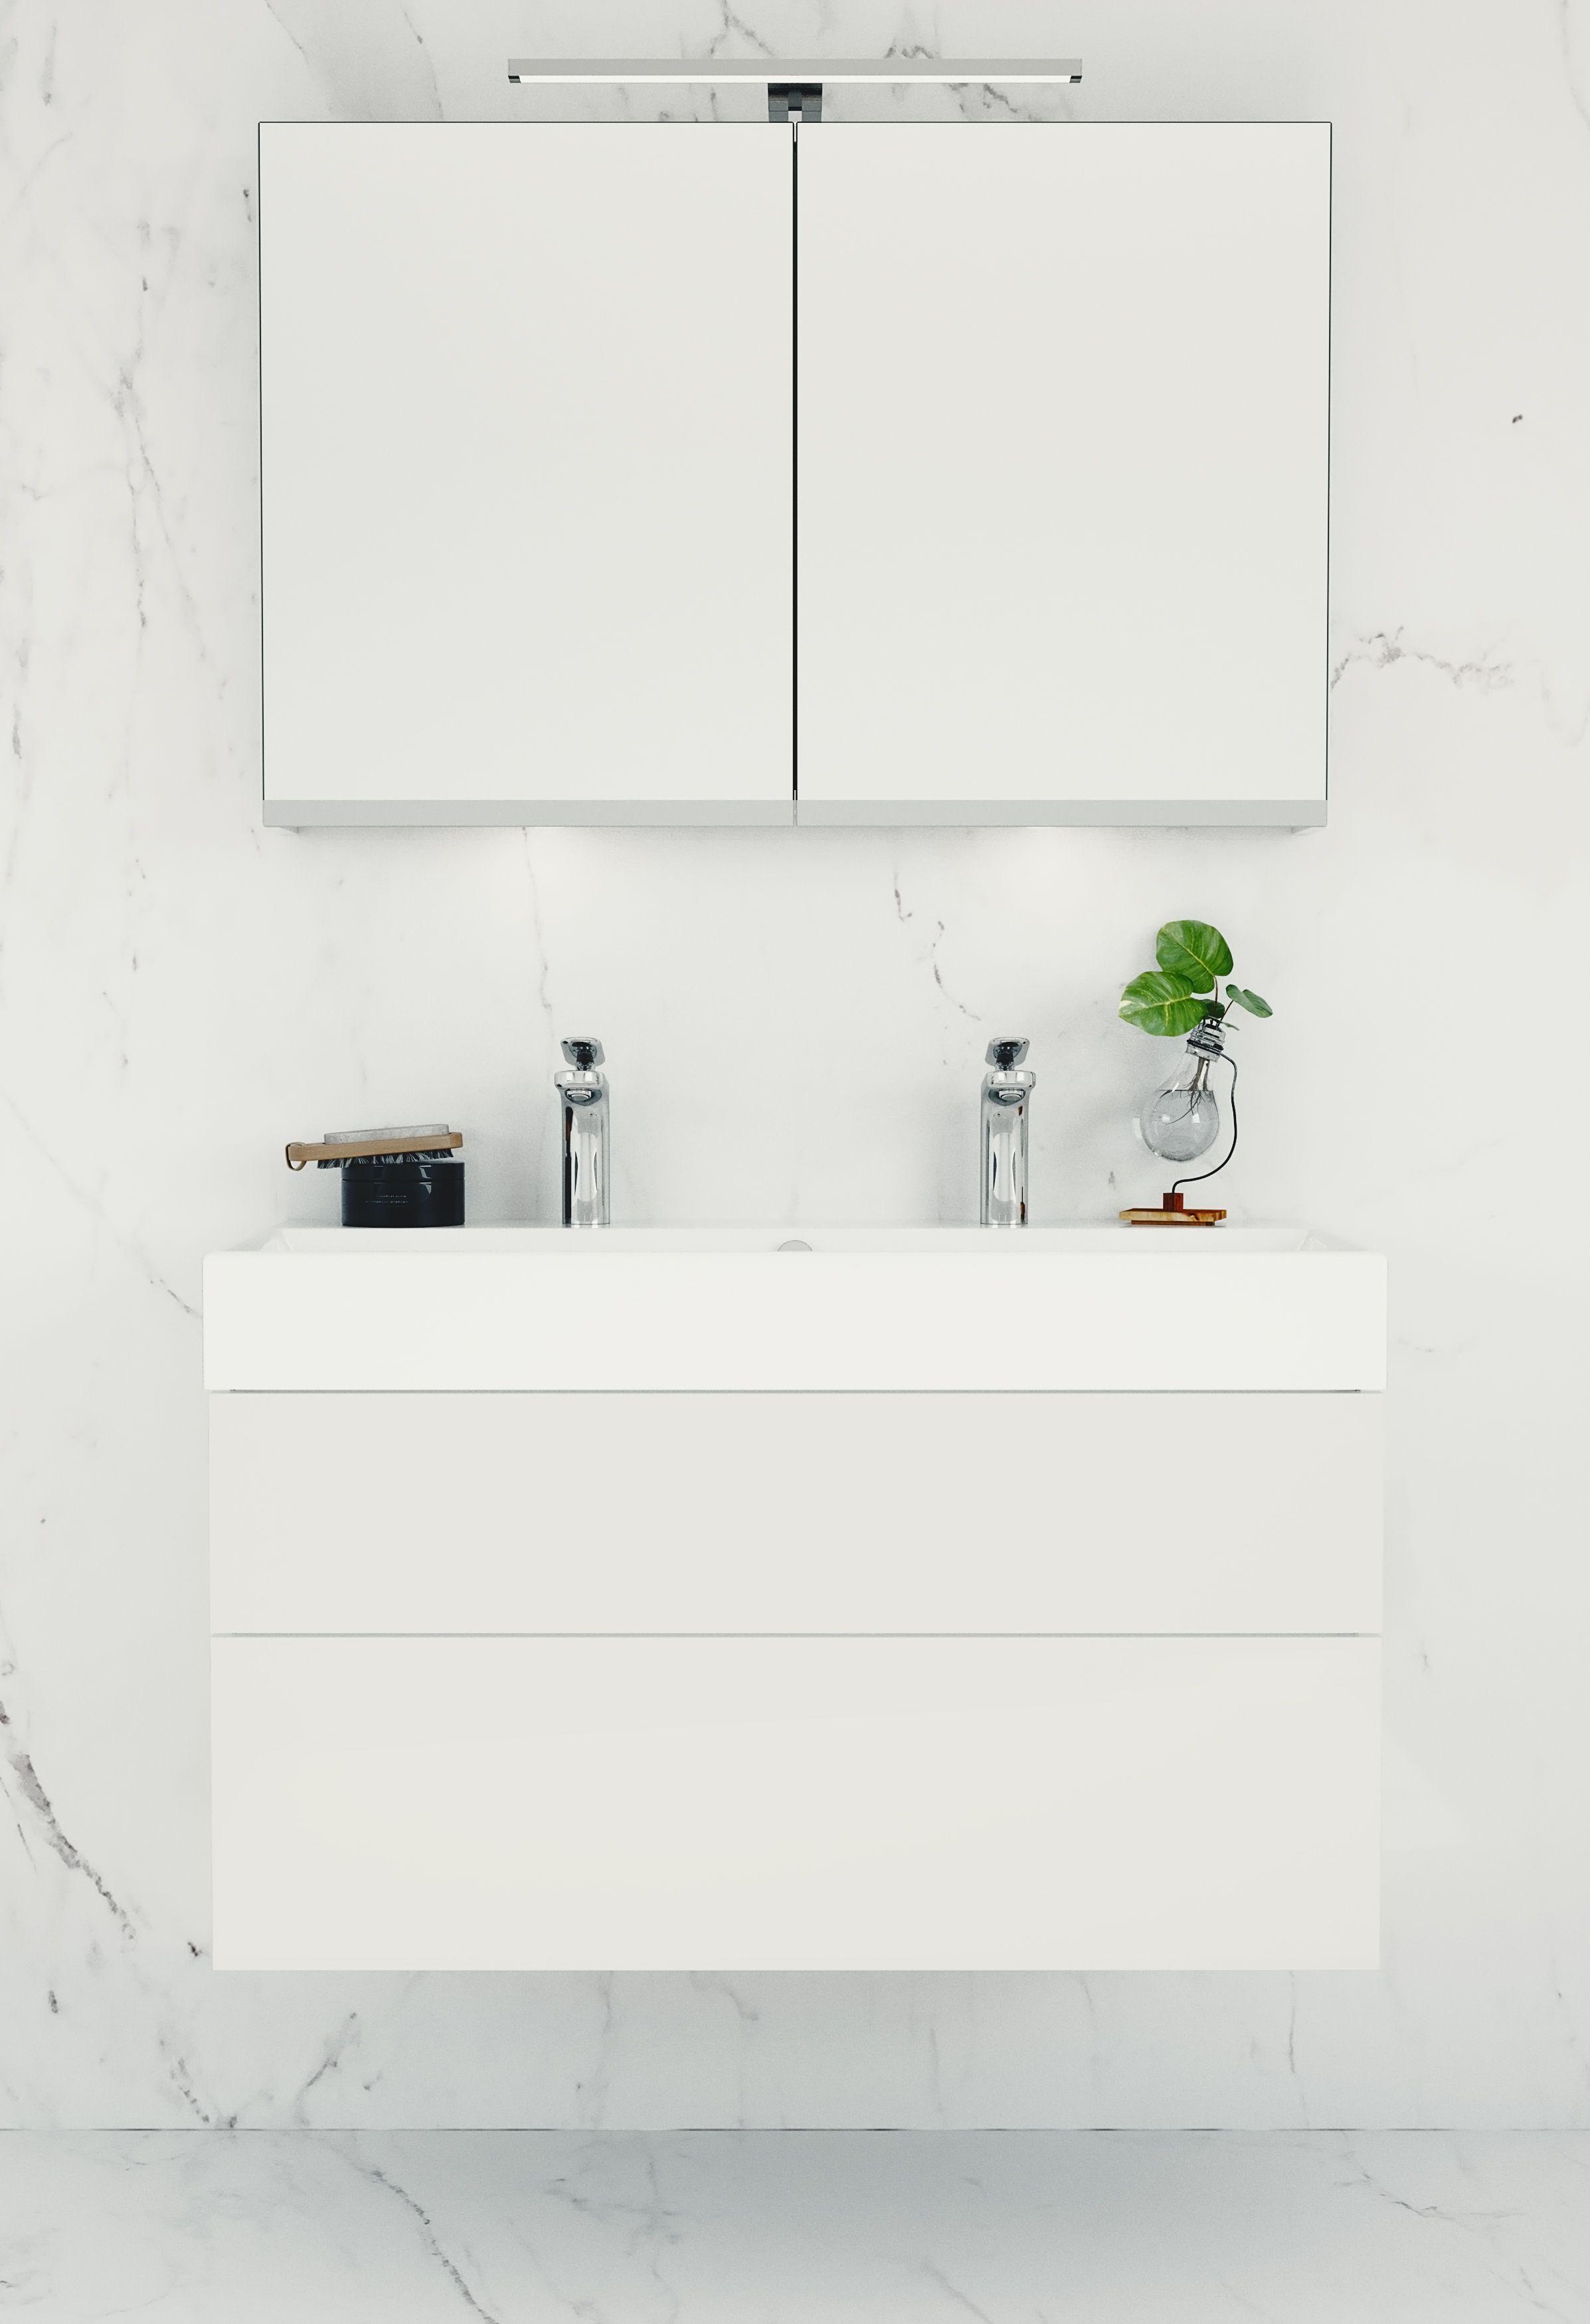 Model: Coast Width: 100 cm Color: A81 Acryllic White gloss Type: F ...